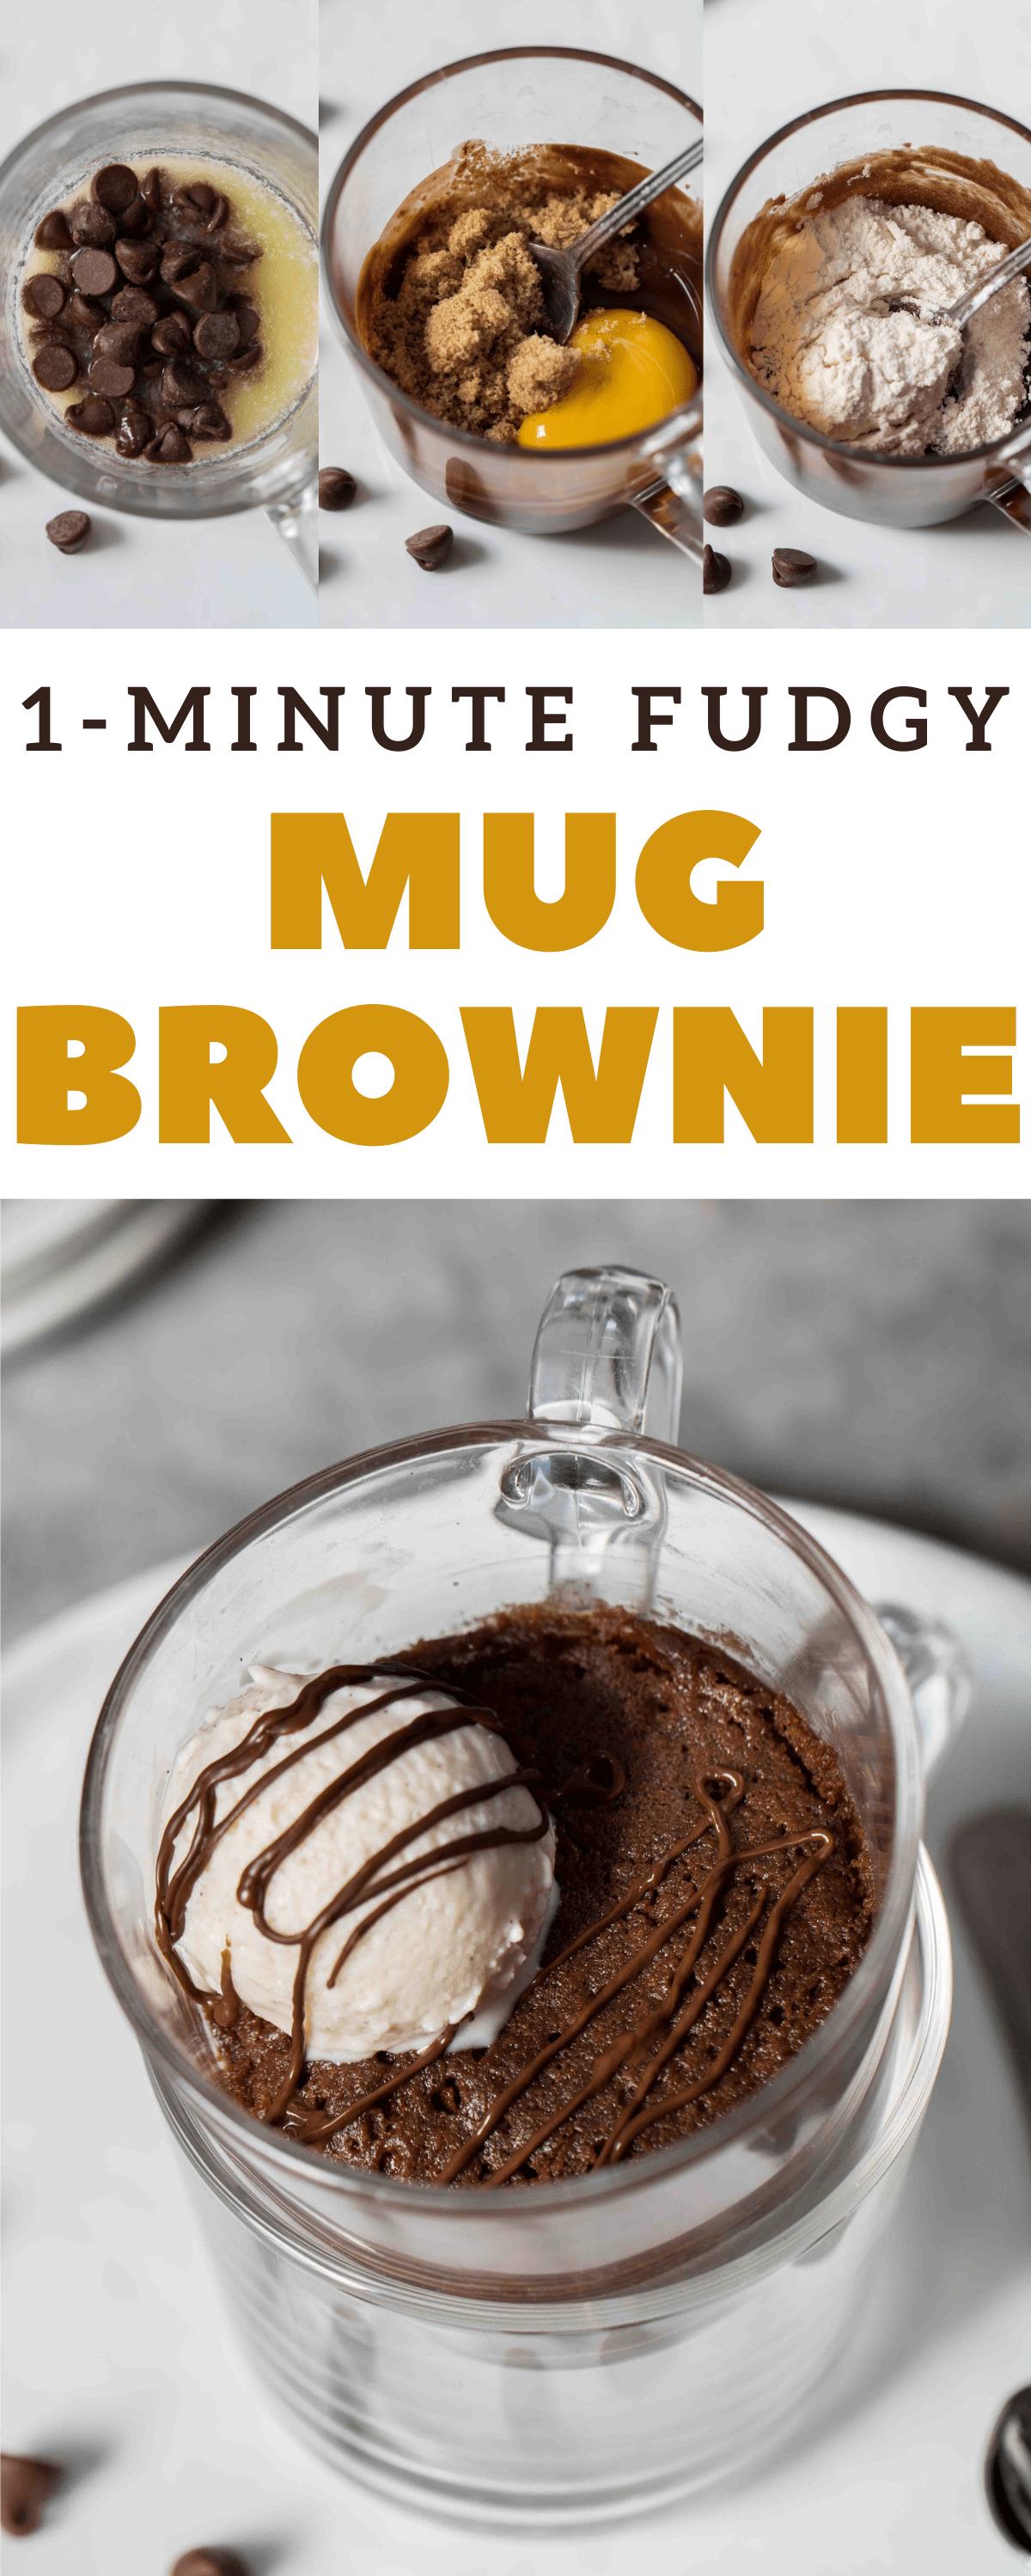 The Best Fudgy 1 Minute Brownie Mug Cake Lifestyle Of A Foodie